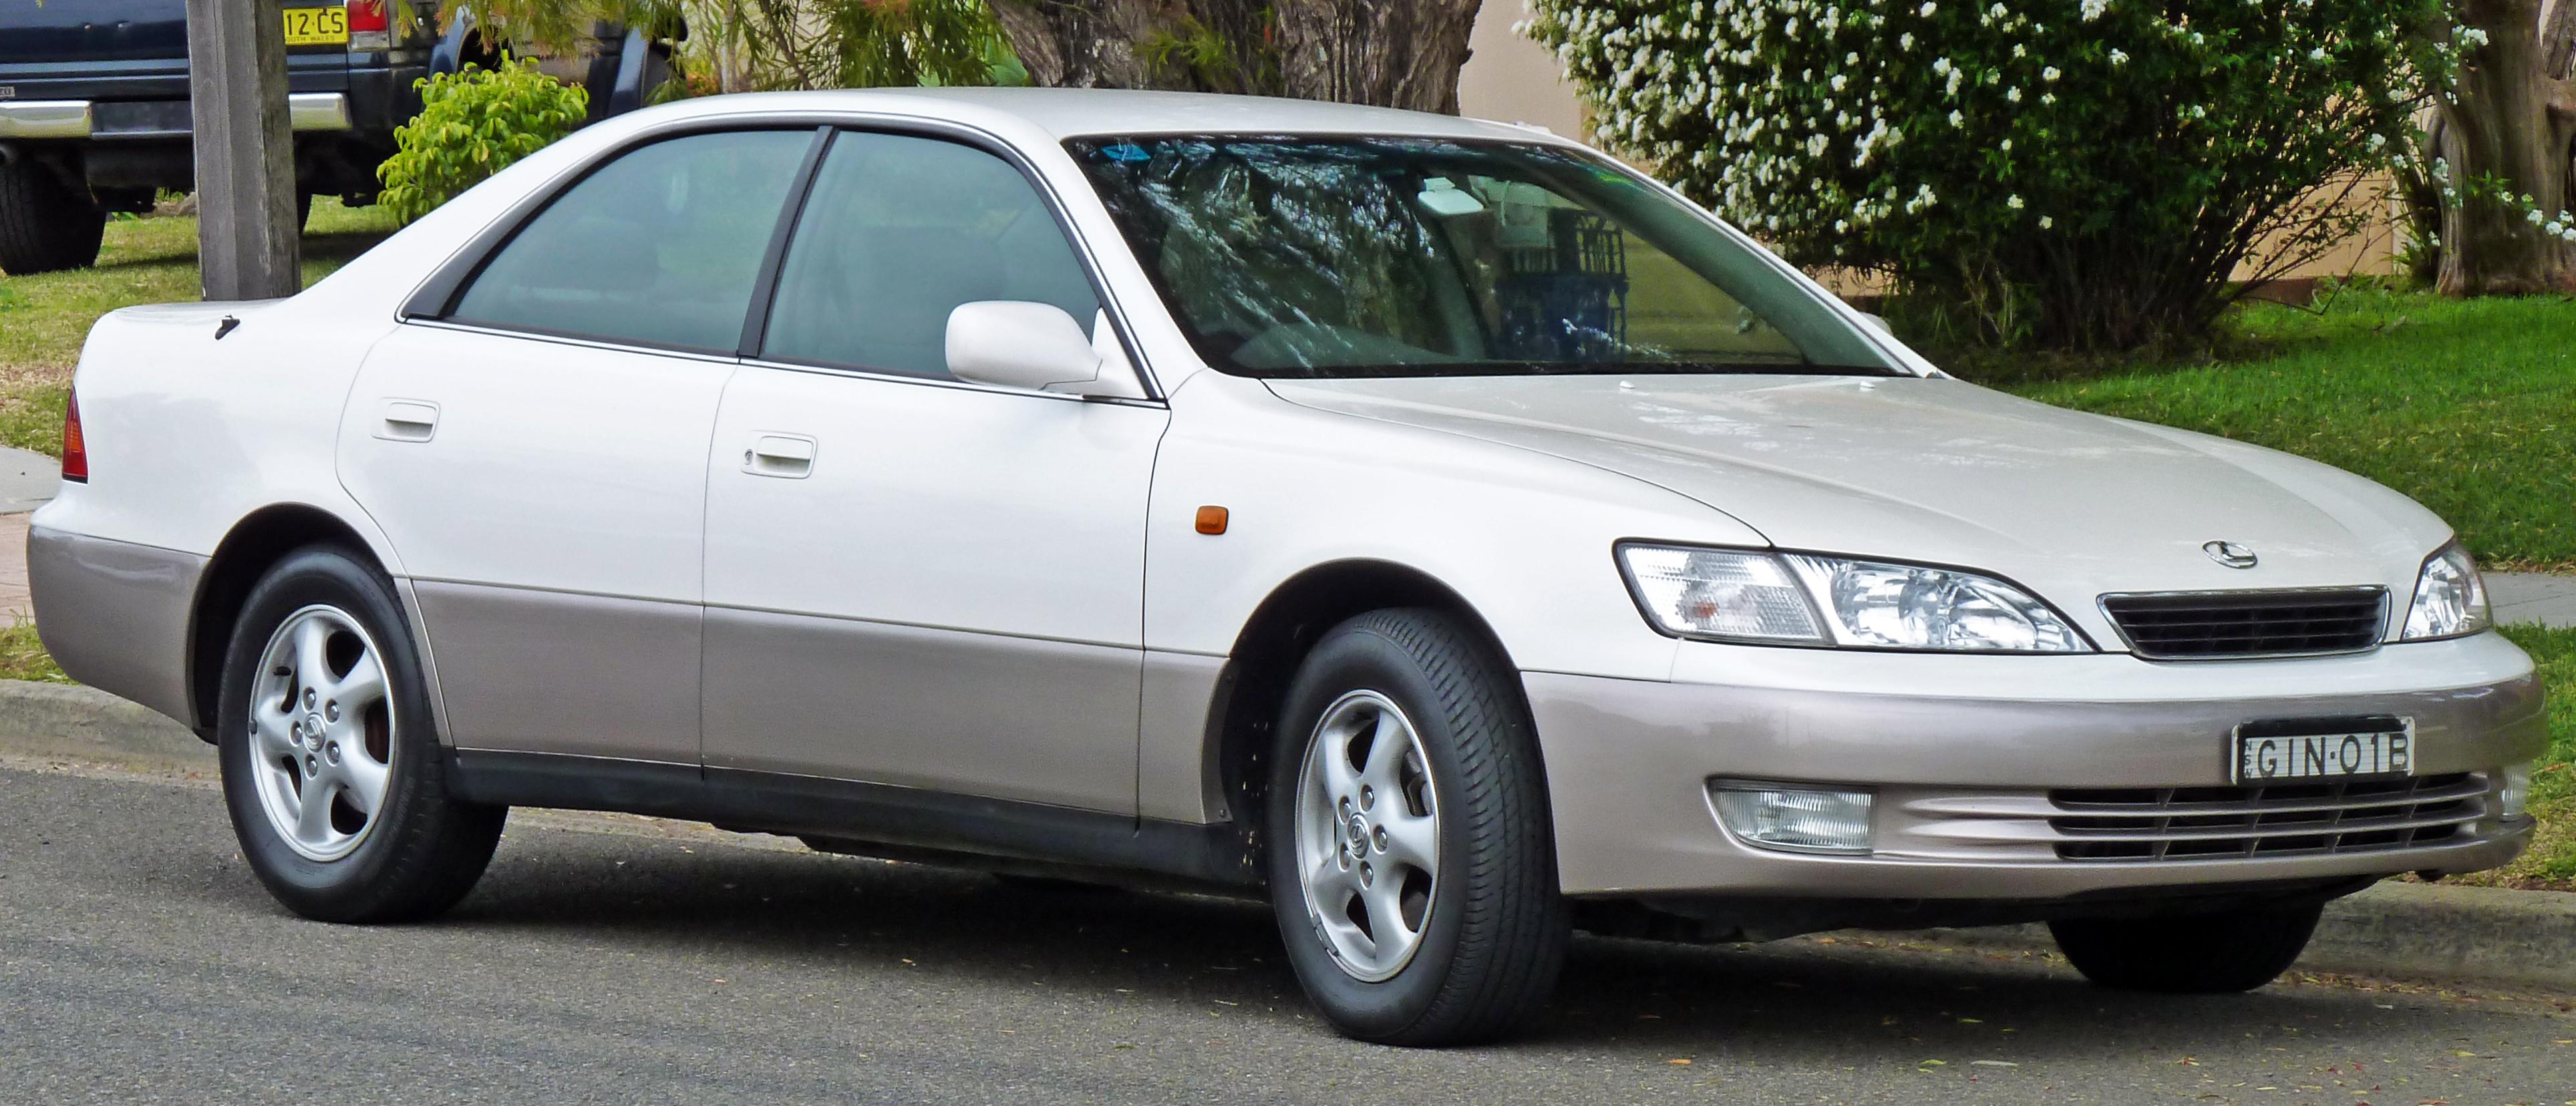 1999 lexus es 300 - partsopen